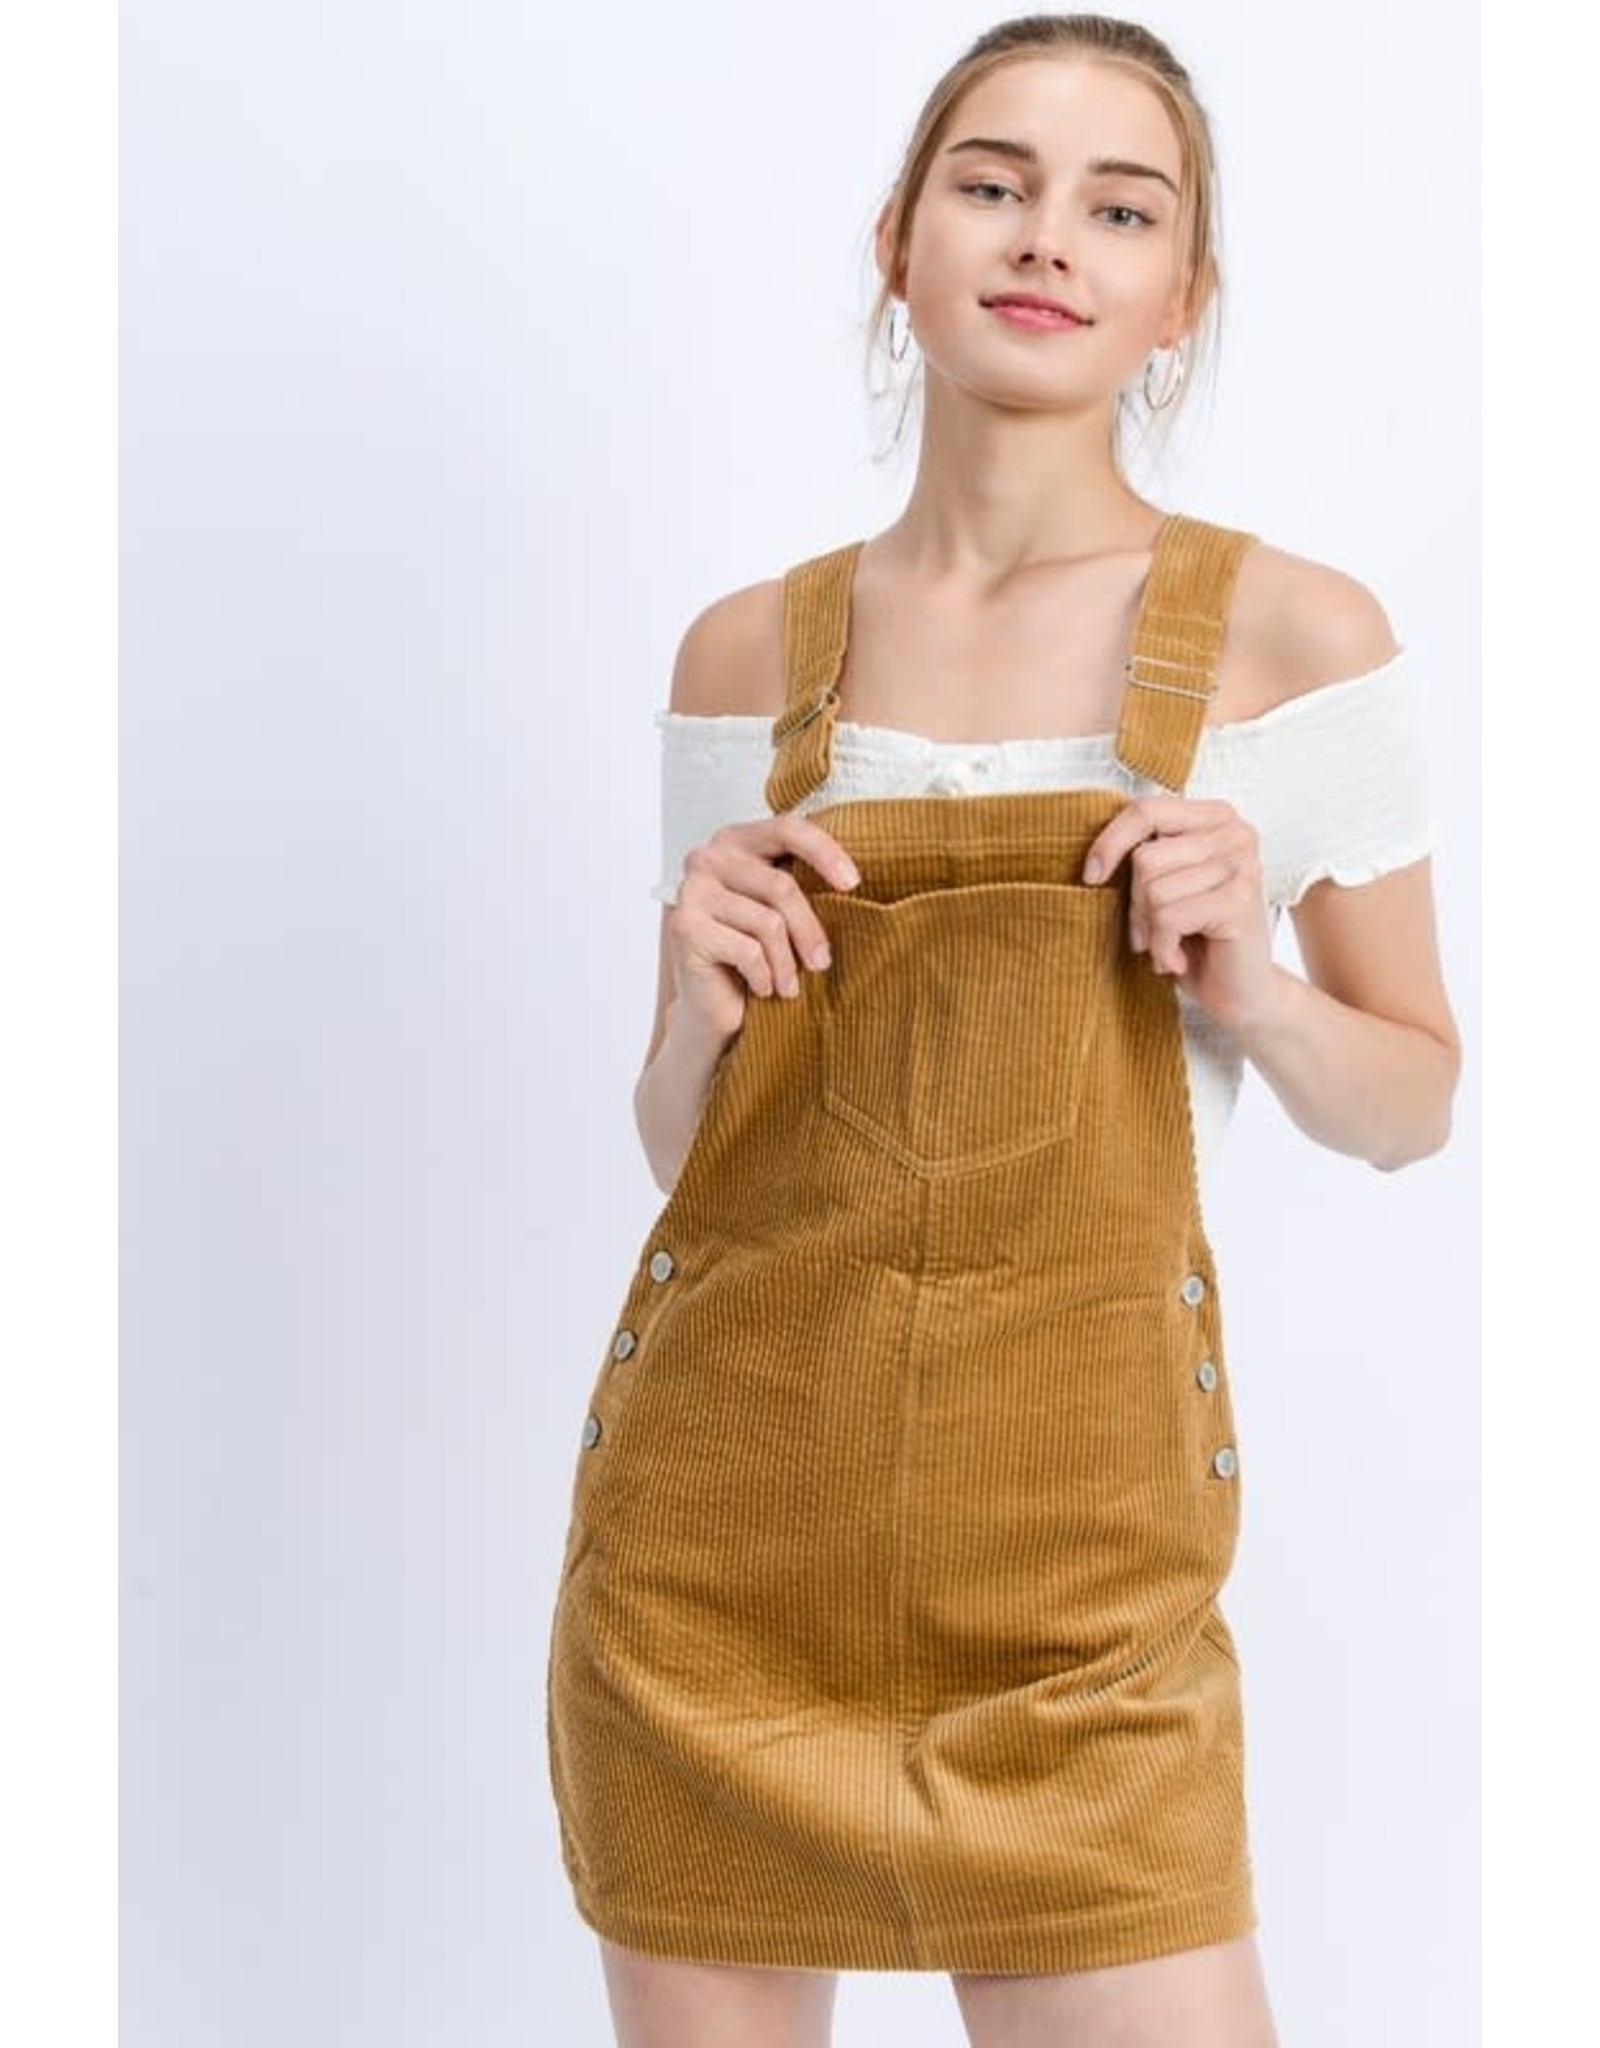 TLC CORDUROY OVERALL DRESS